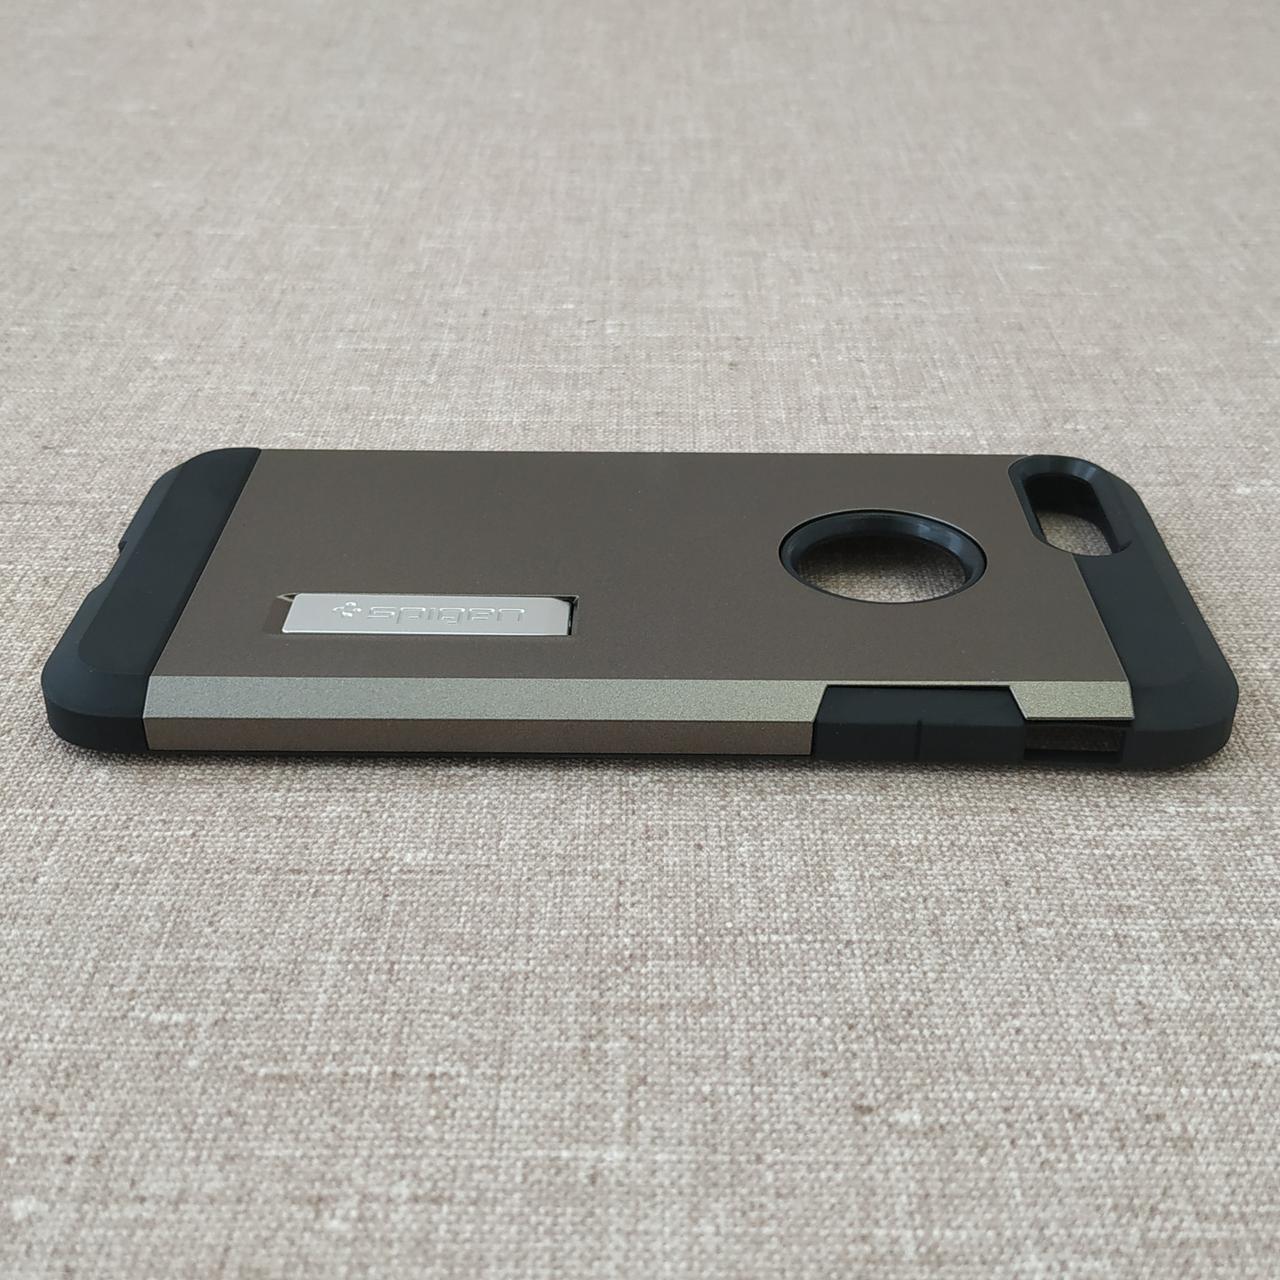 Spigen Tough Armor iPhone 7 Plus ganmetal Для телефона